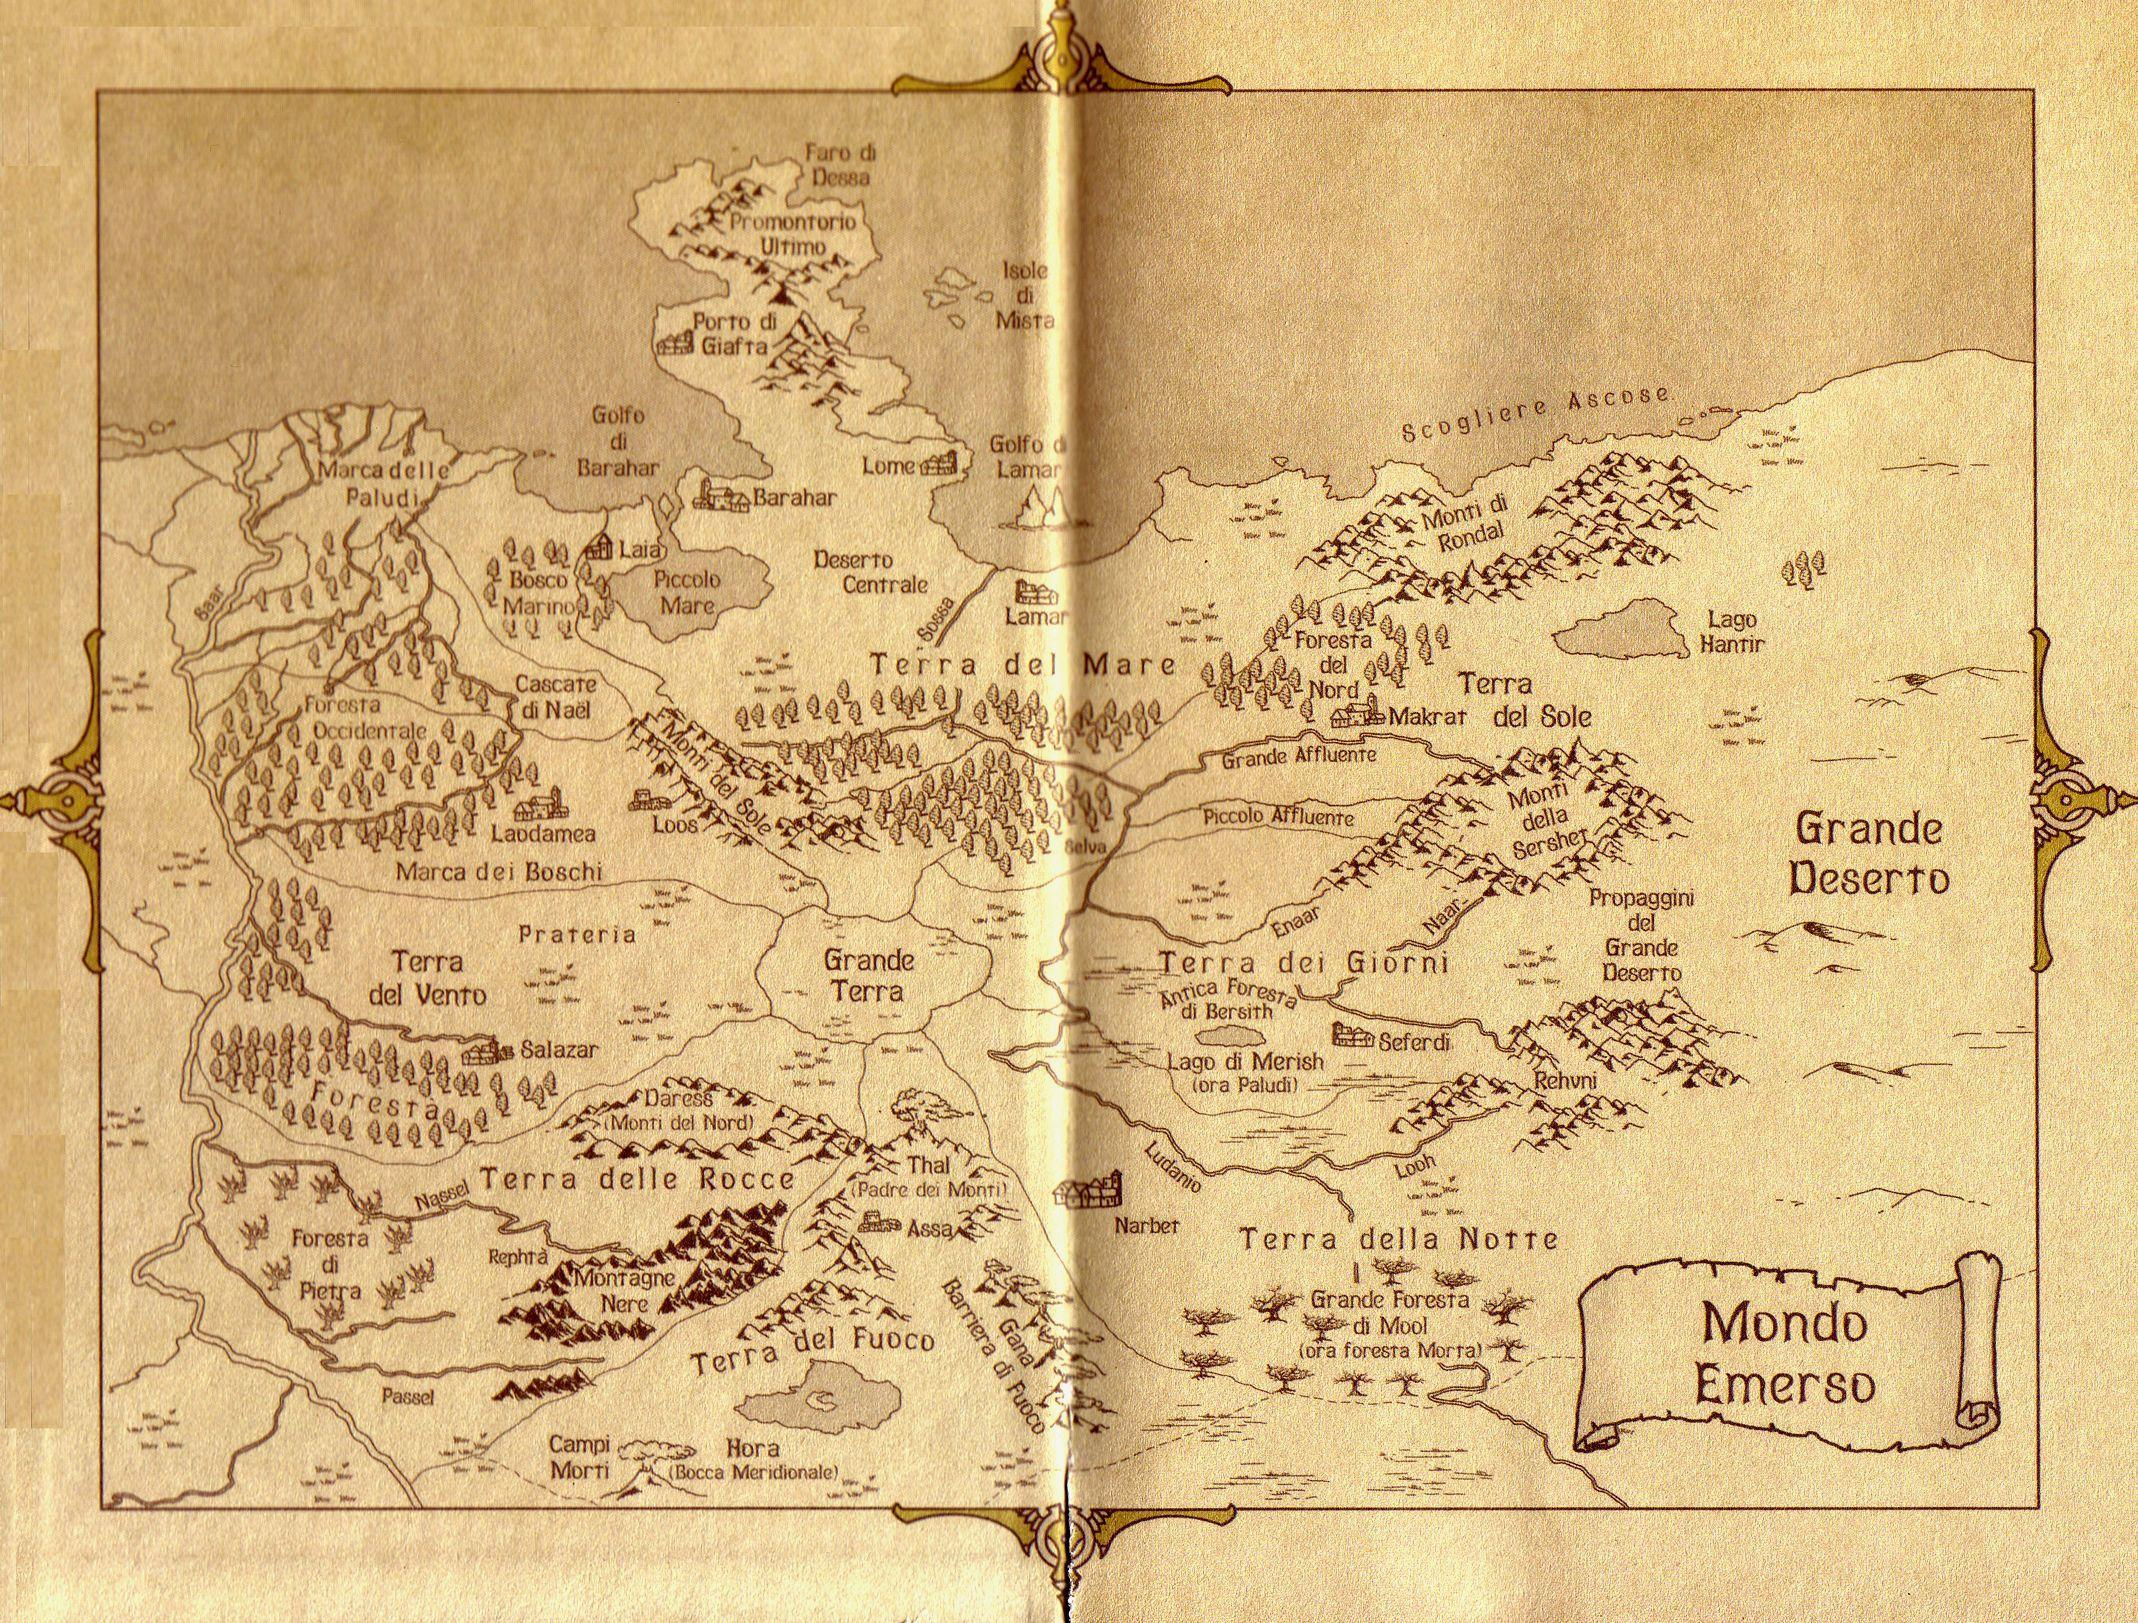 La carte du monde Emergé Mappa